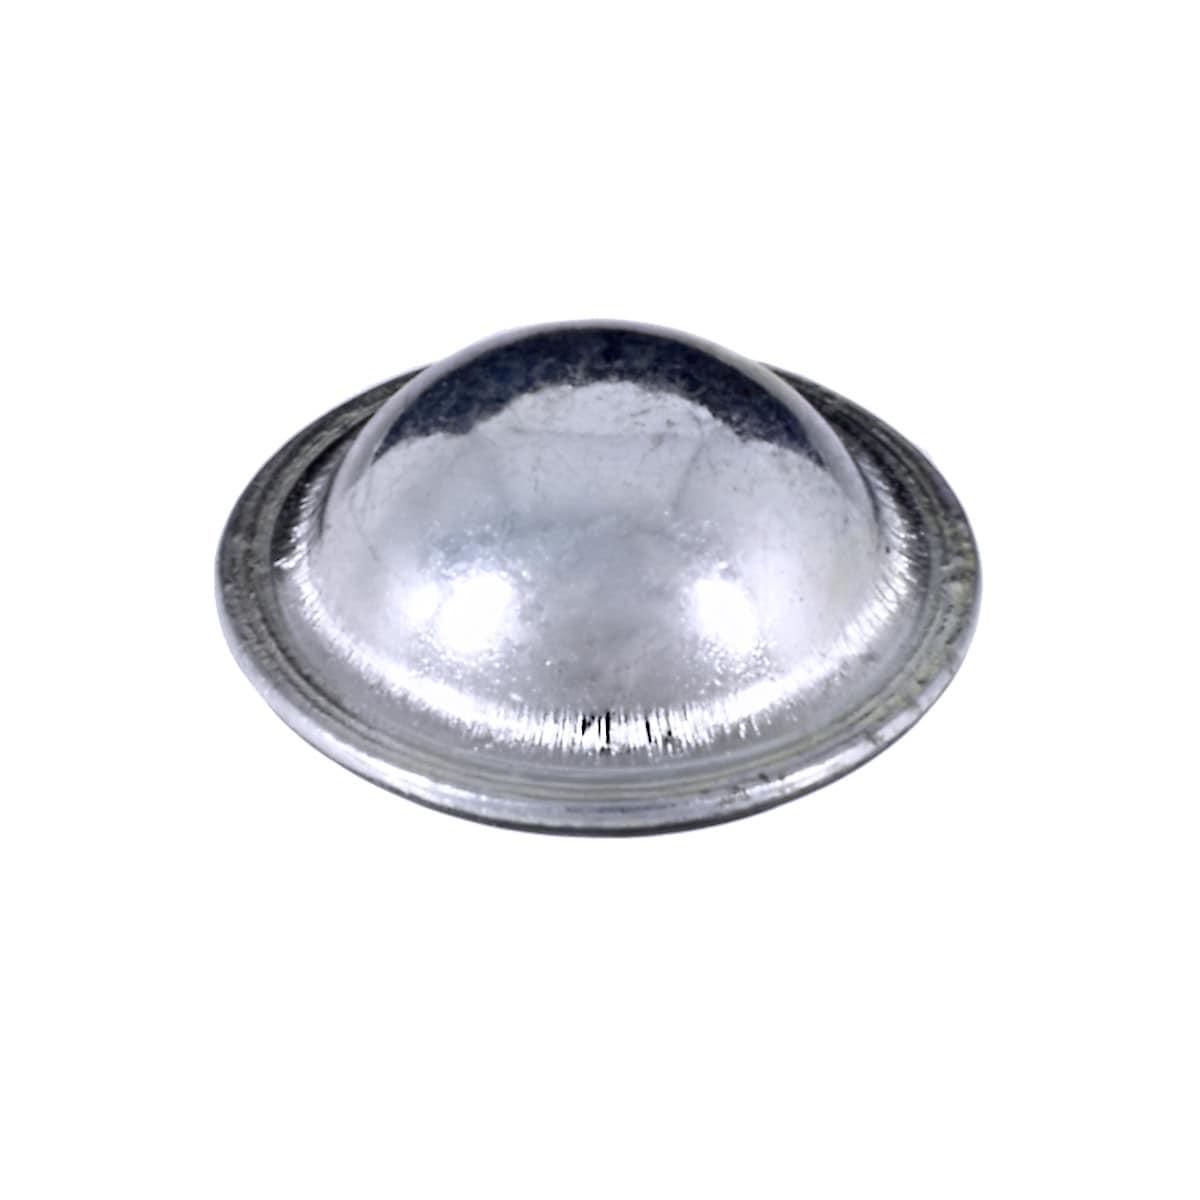 Starlock lukkolevy 5 mm